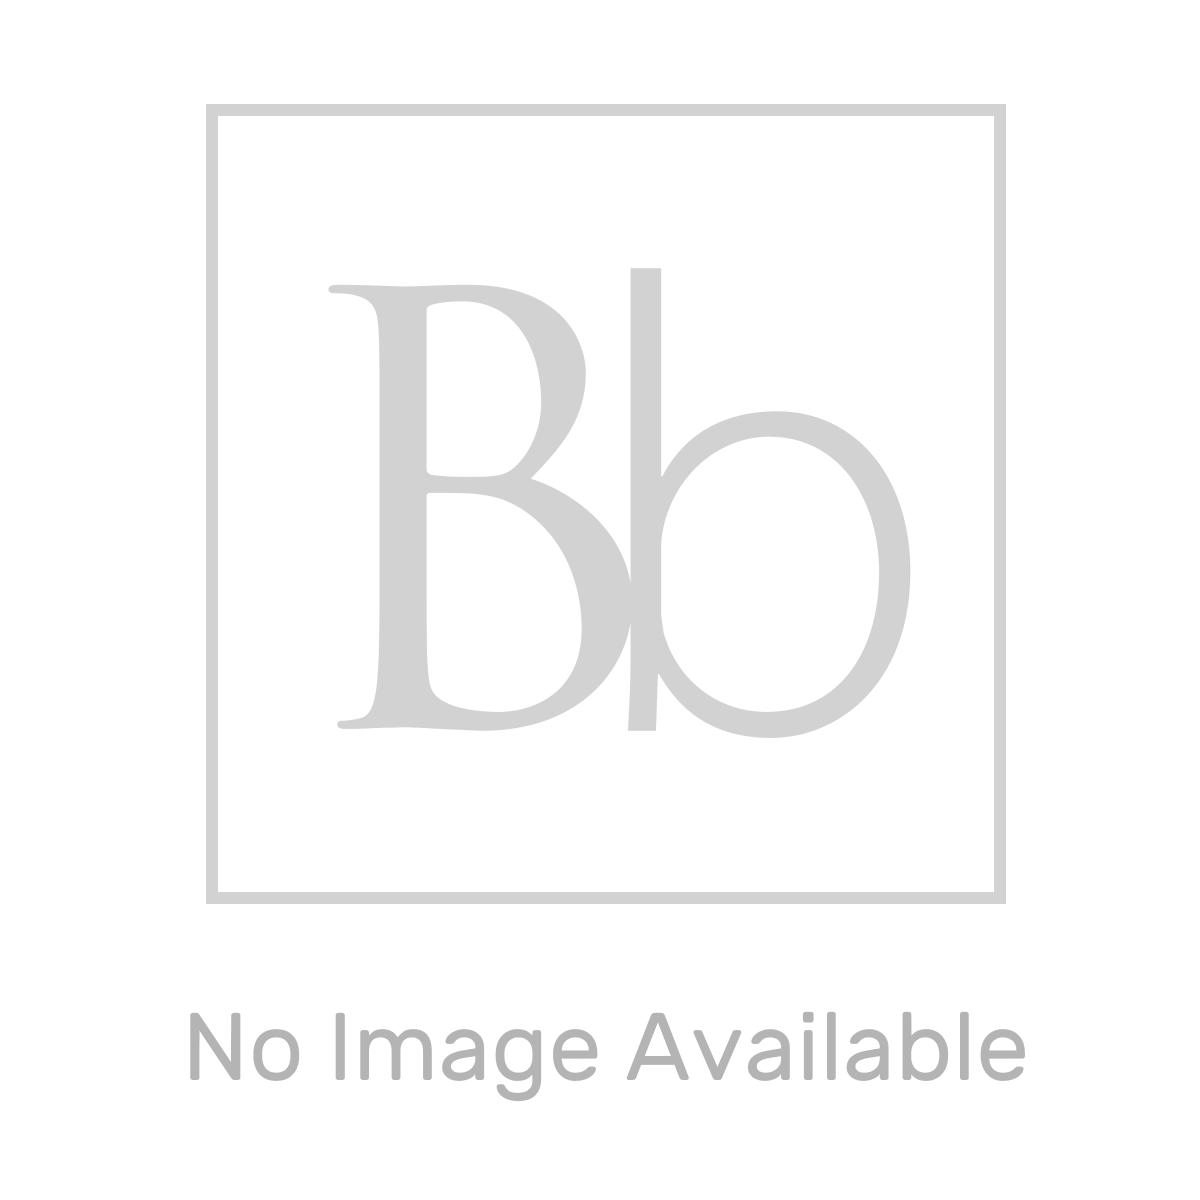 Kartell Astley Matt Grey Front Bath Panel 1700mm